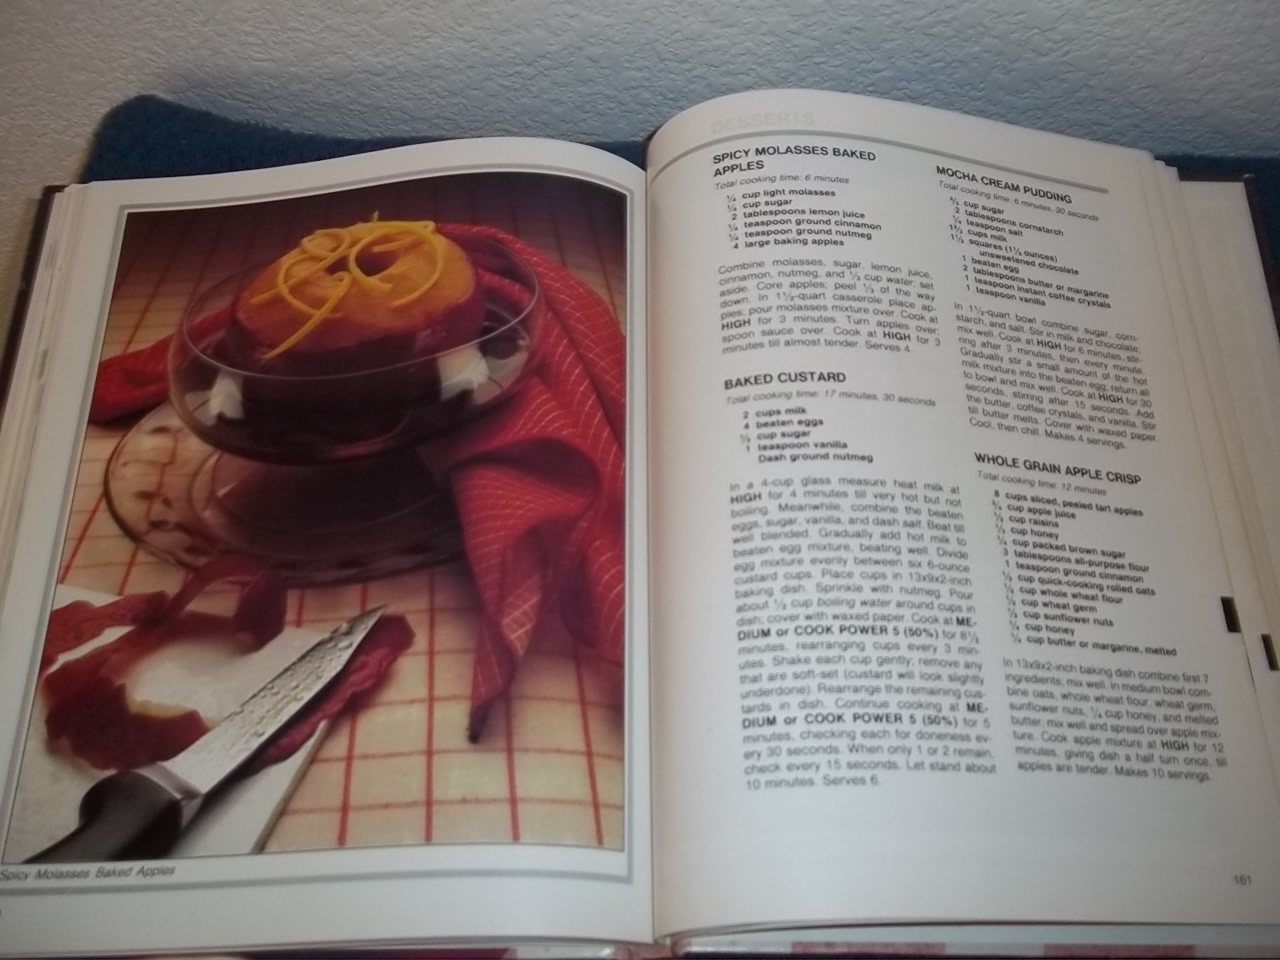 WHIRLPOOL MICRO MENUS COOKBOOK - YEAR 1983 - HARDCOVER